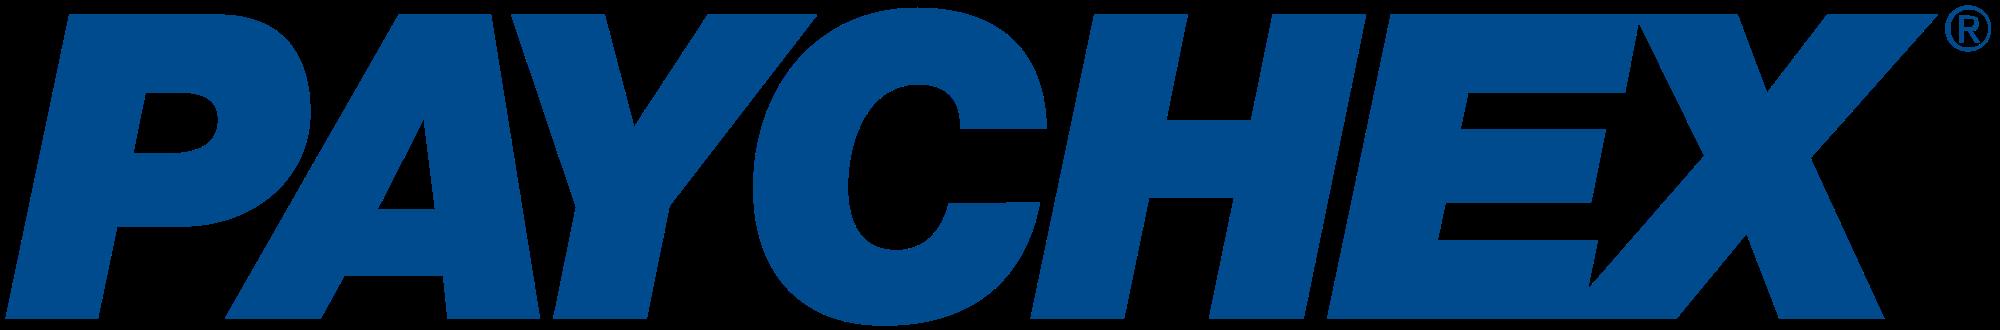 Paychex Employee Benefits logo